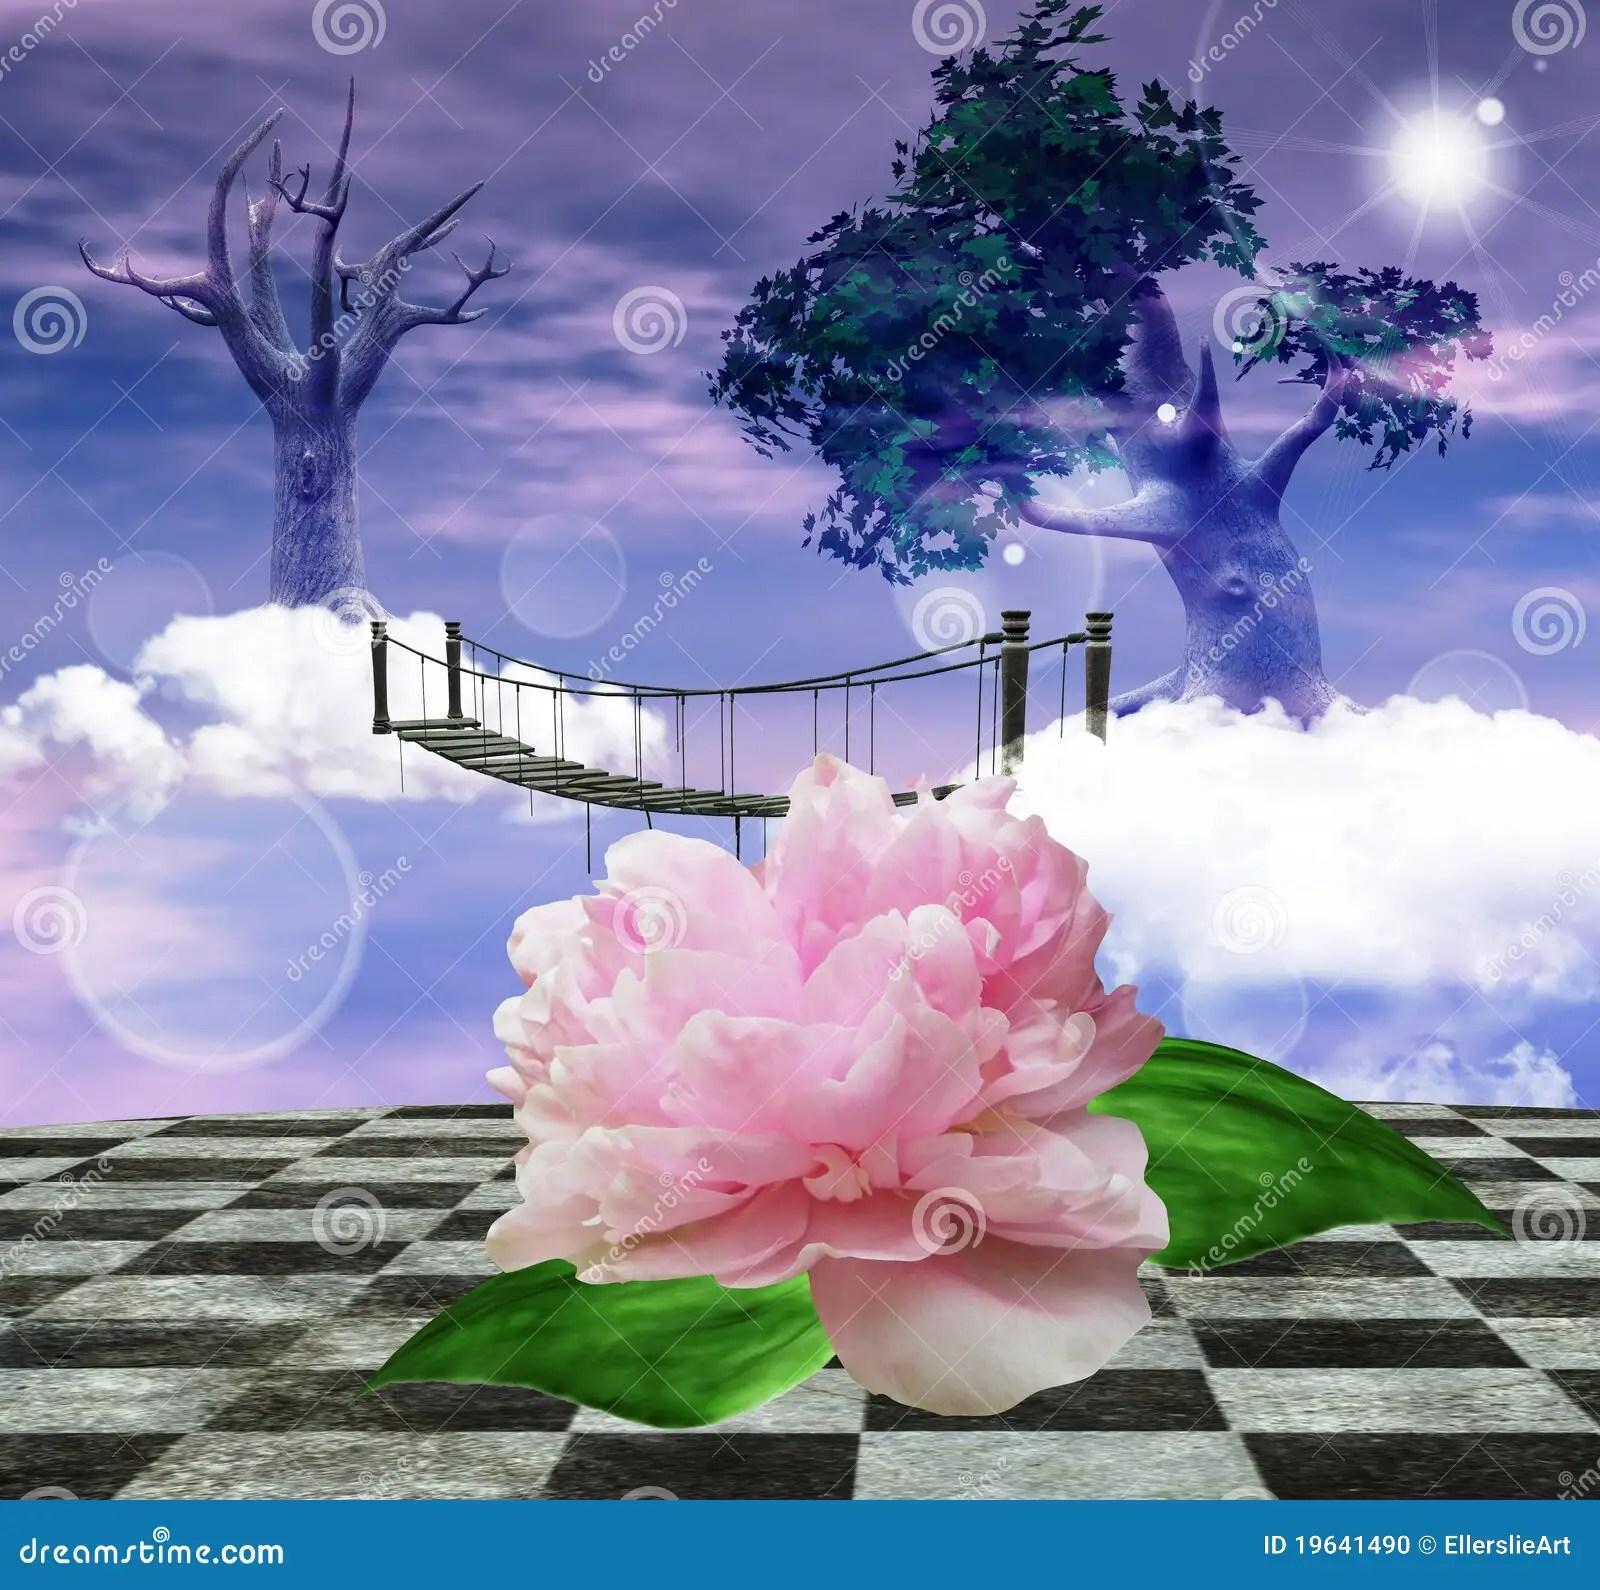 Pink Animal Print Wallpaper Enchanted Nature Series Surreal Nature Stock Photo